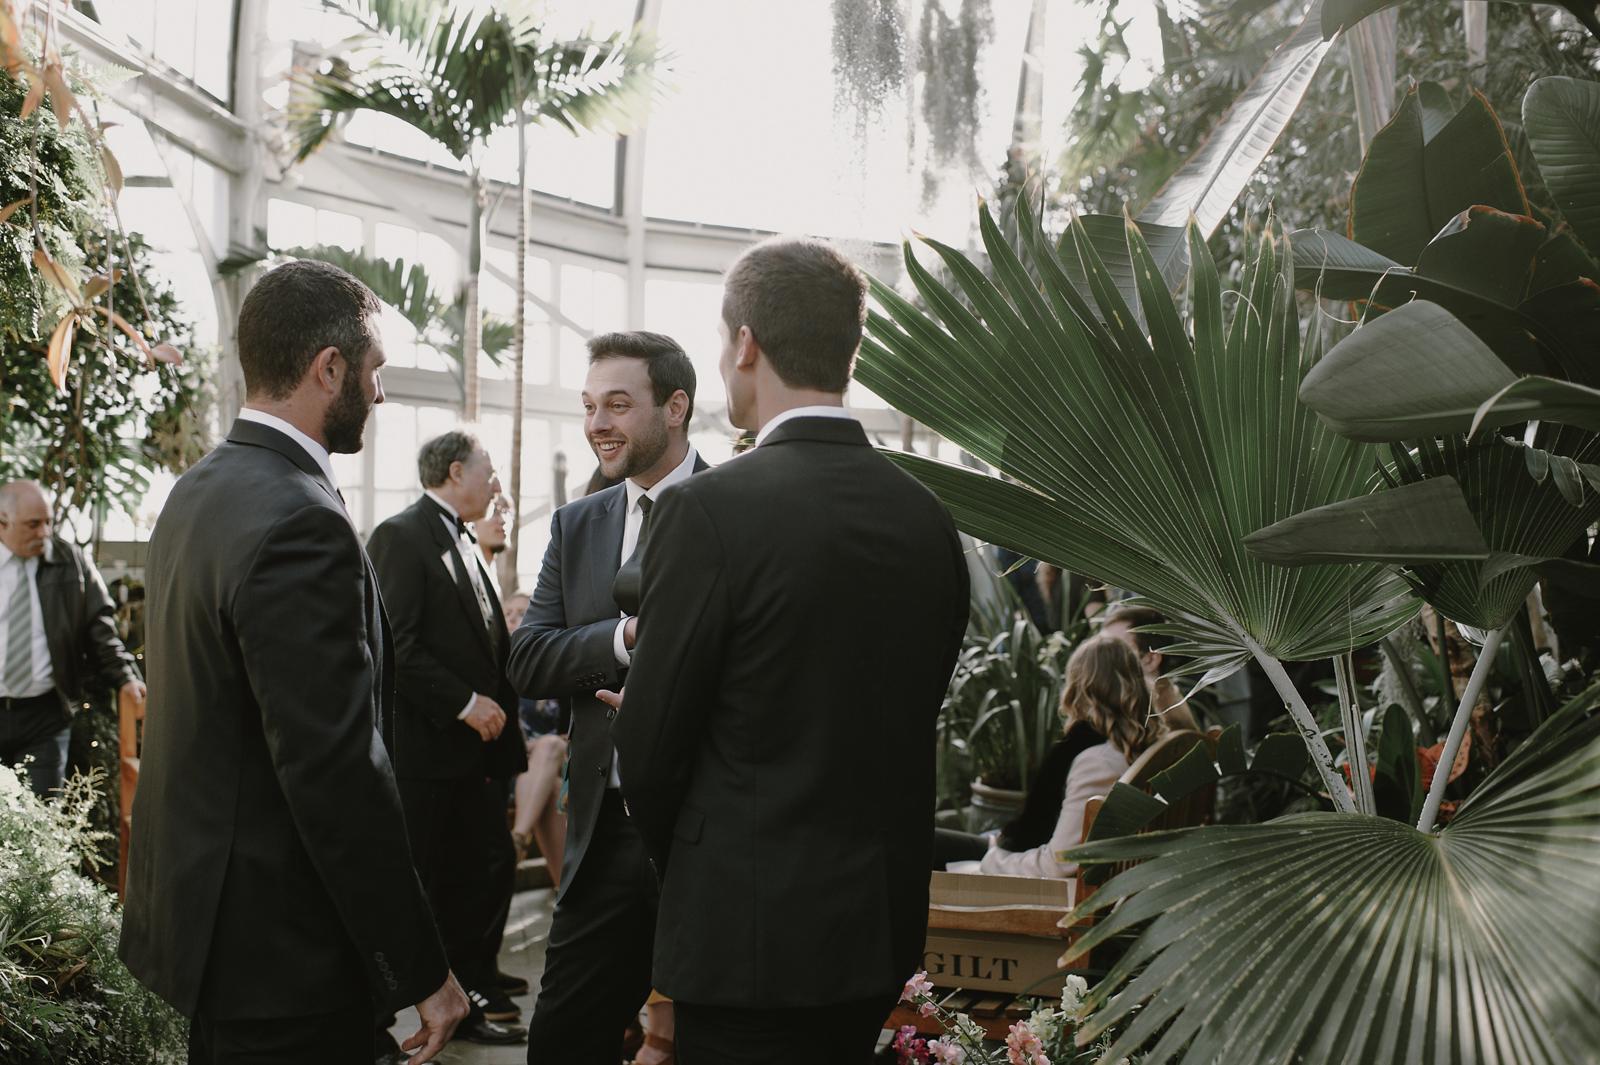 kristenmarieparker_tacoma_conservatory_warehouse_wedding028.JPG